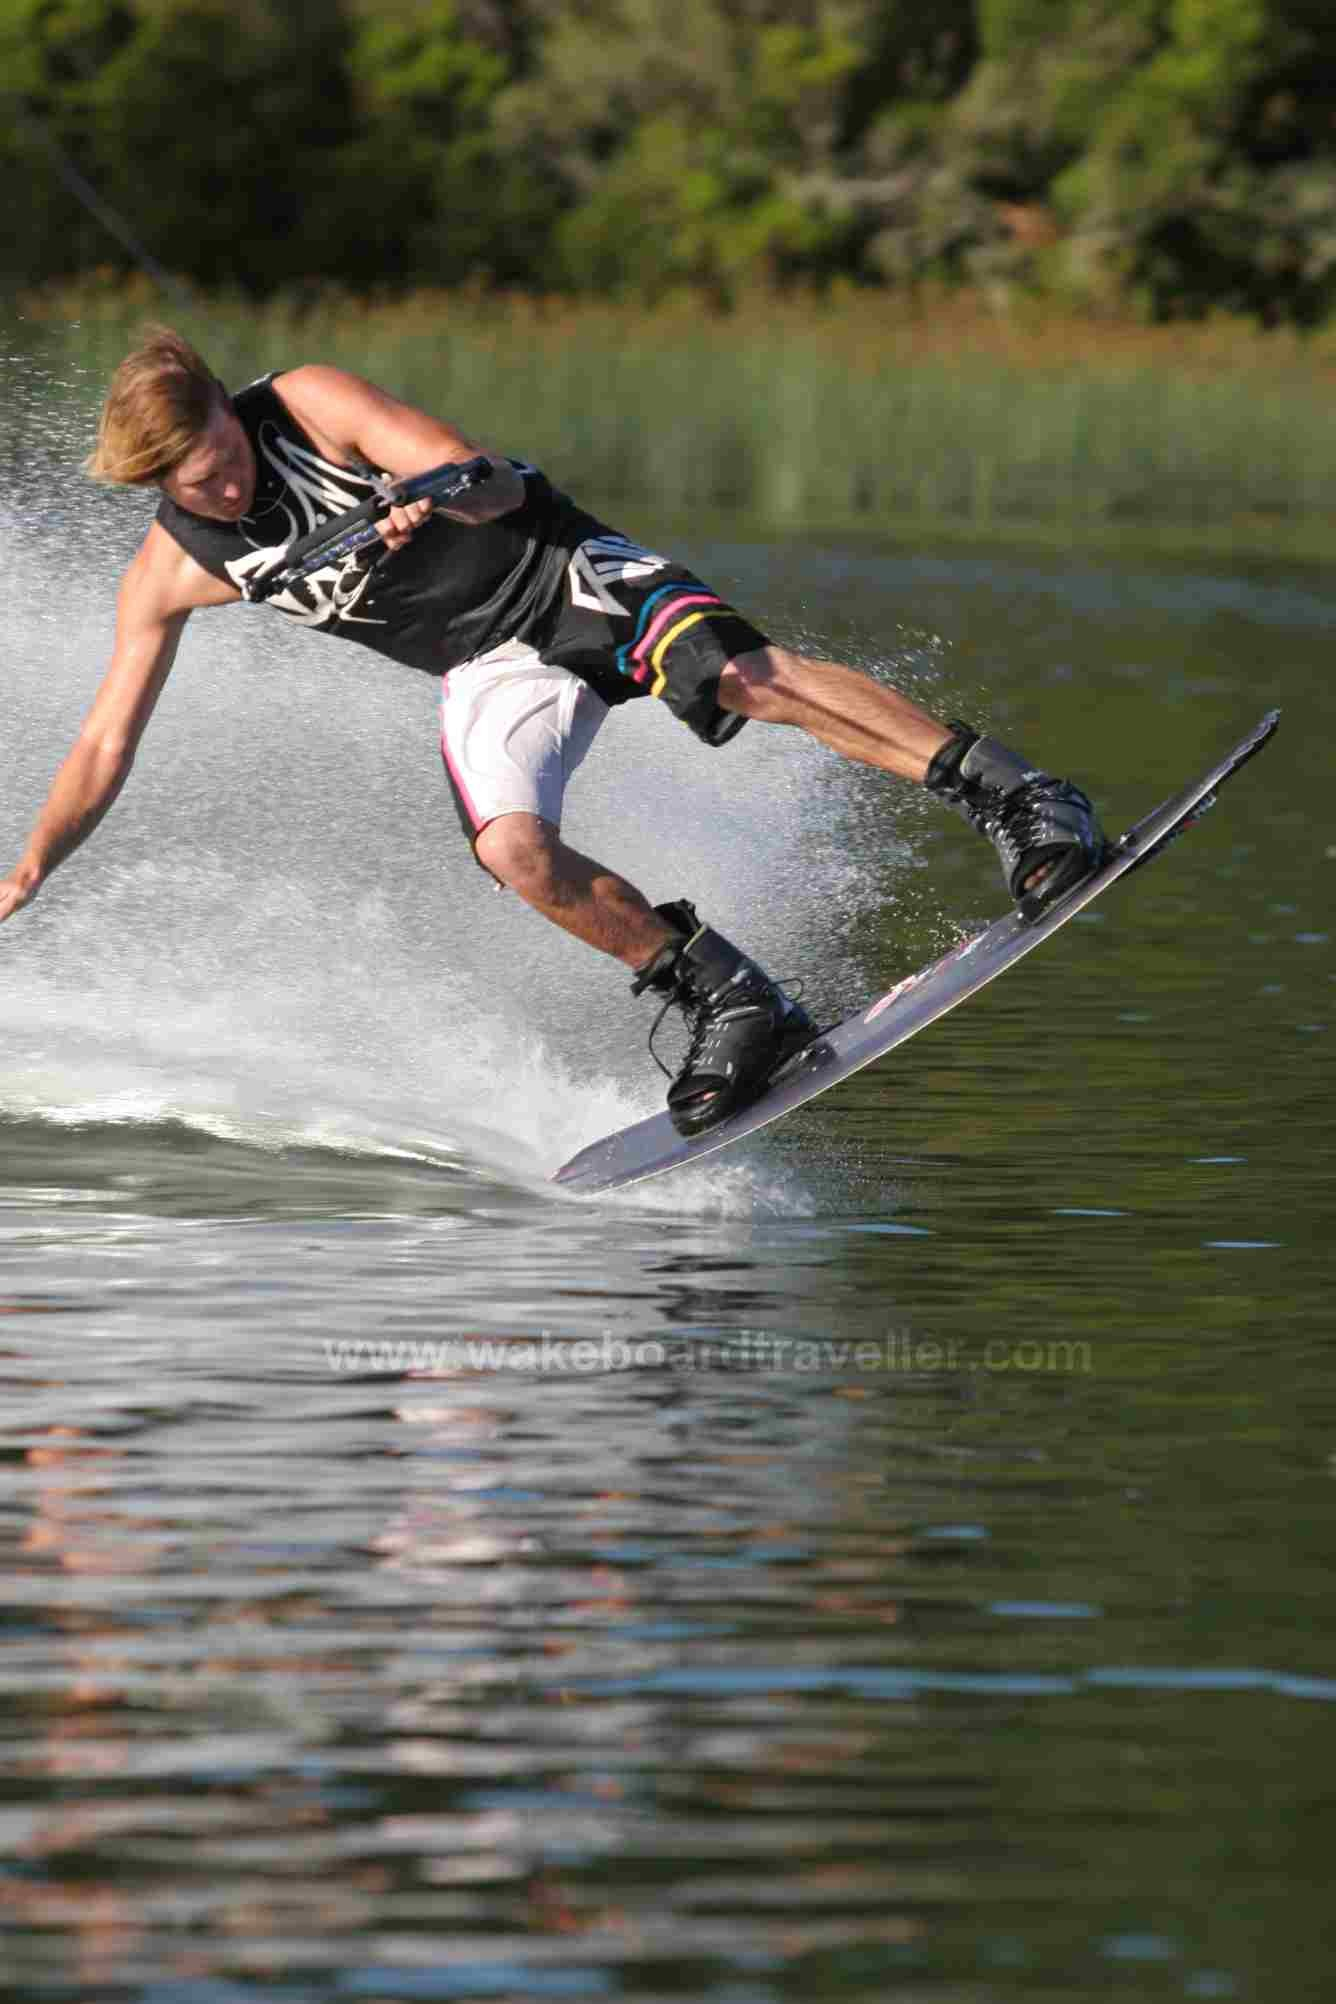 Kristin Bower – Butter Slide Wakeboard trick